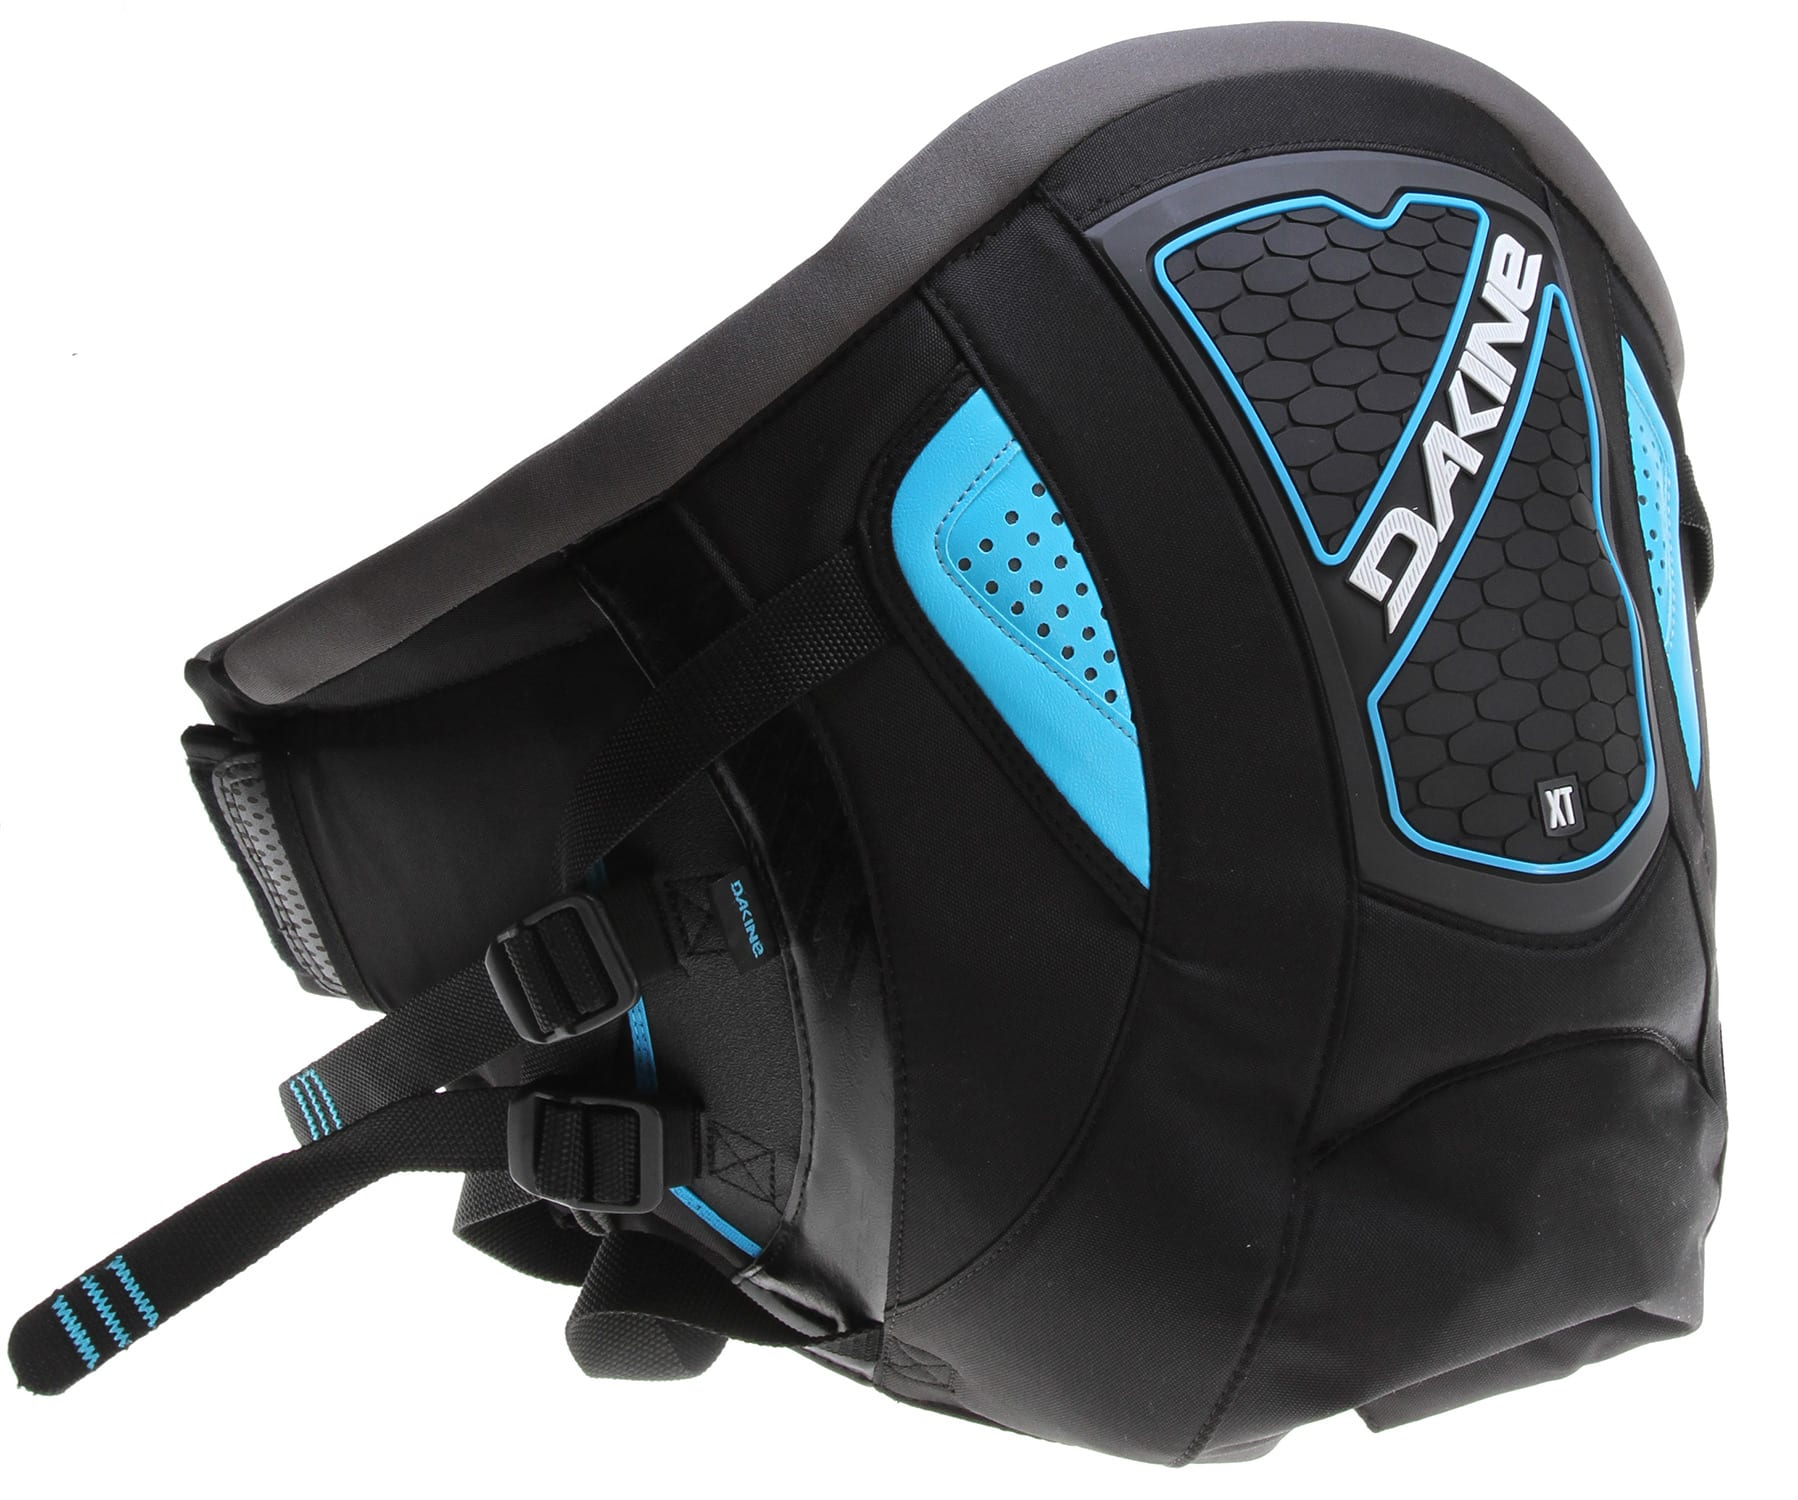 Dakine Xt Seat Windsurf Harness